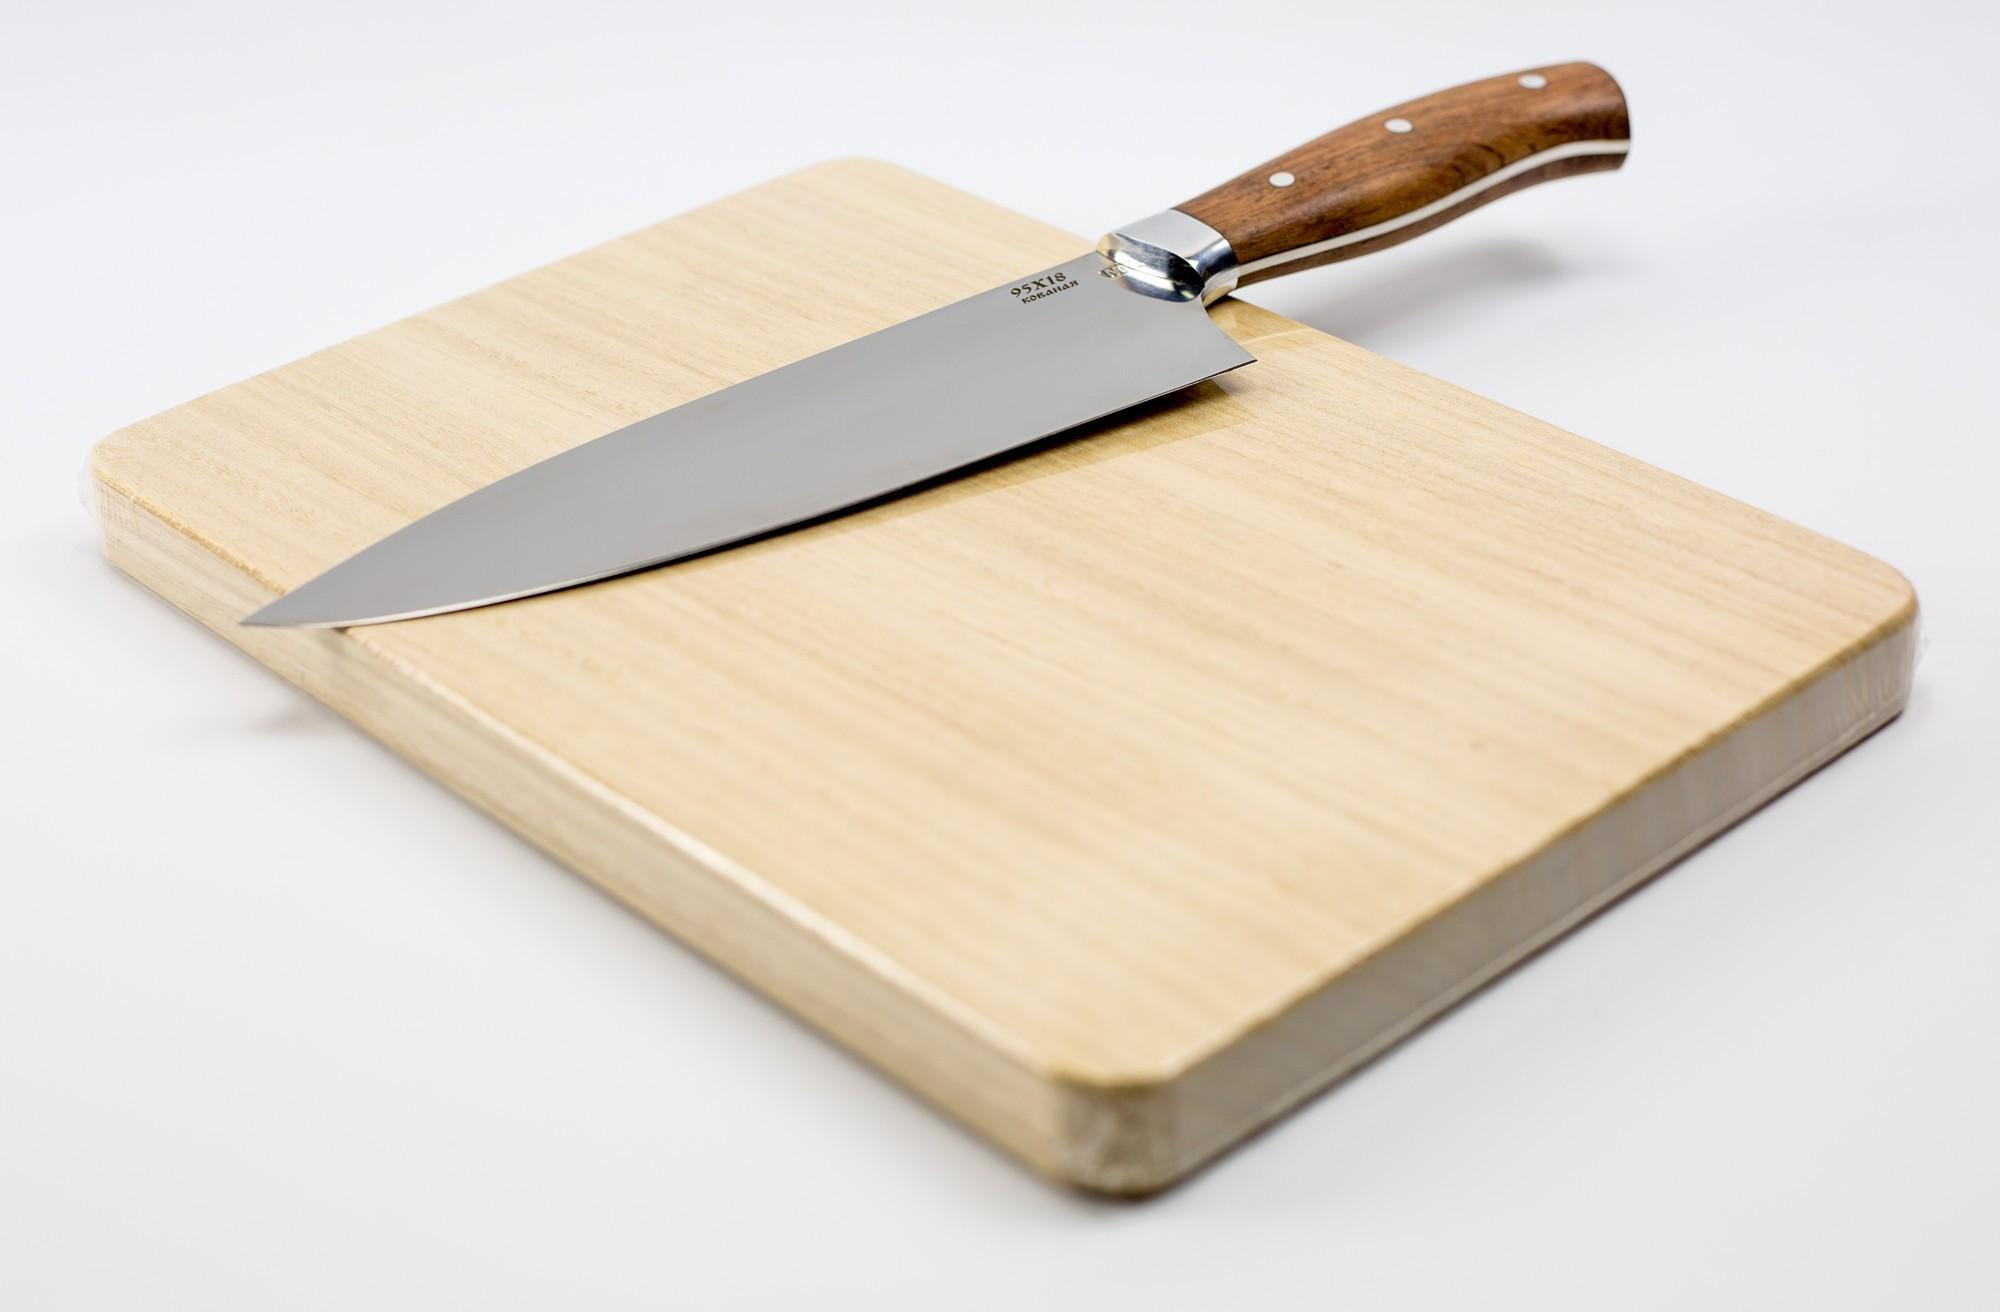 Фото 8 - Доска разделочная (Table size) , 270*190*20мм, Hatamoto